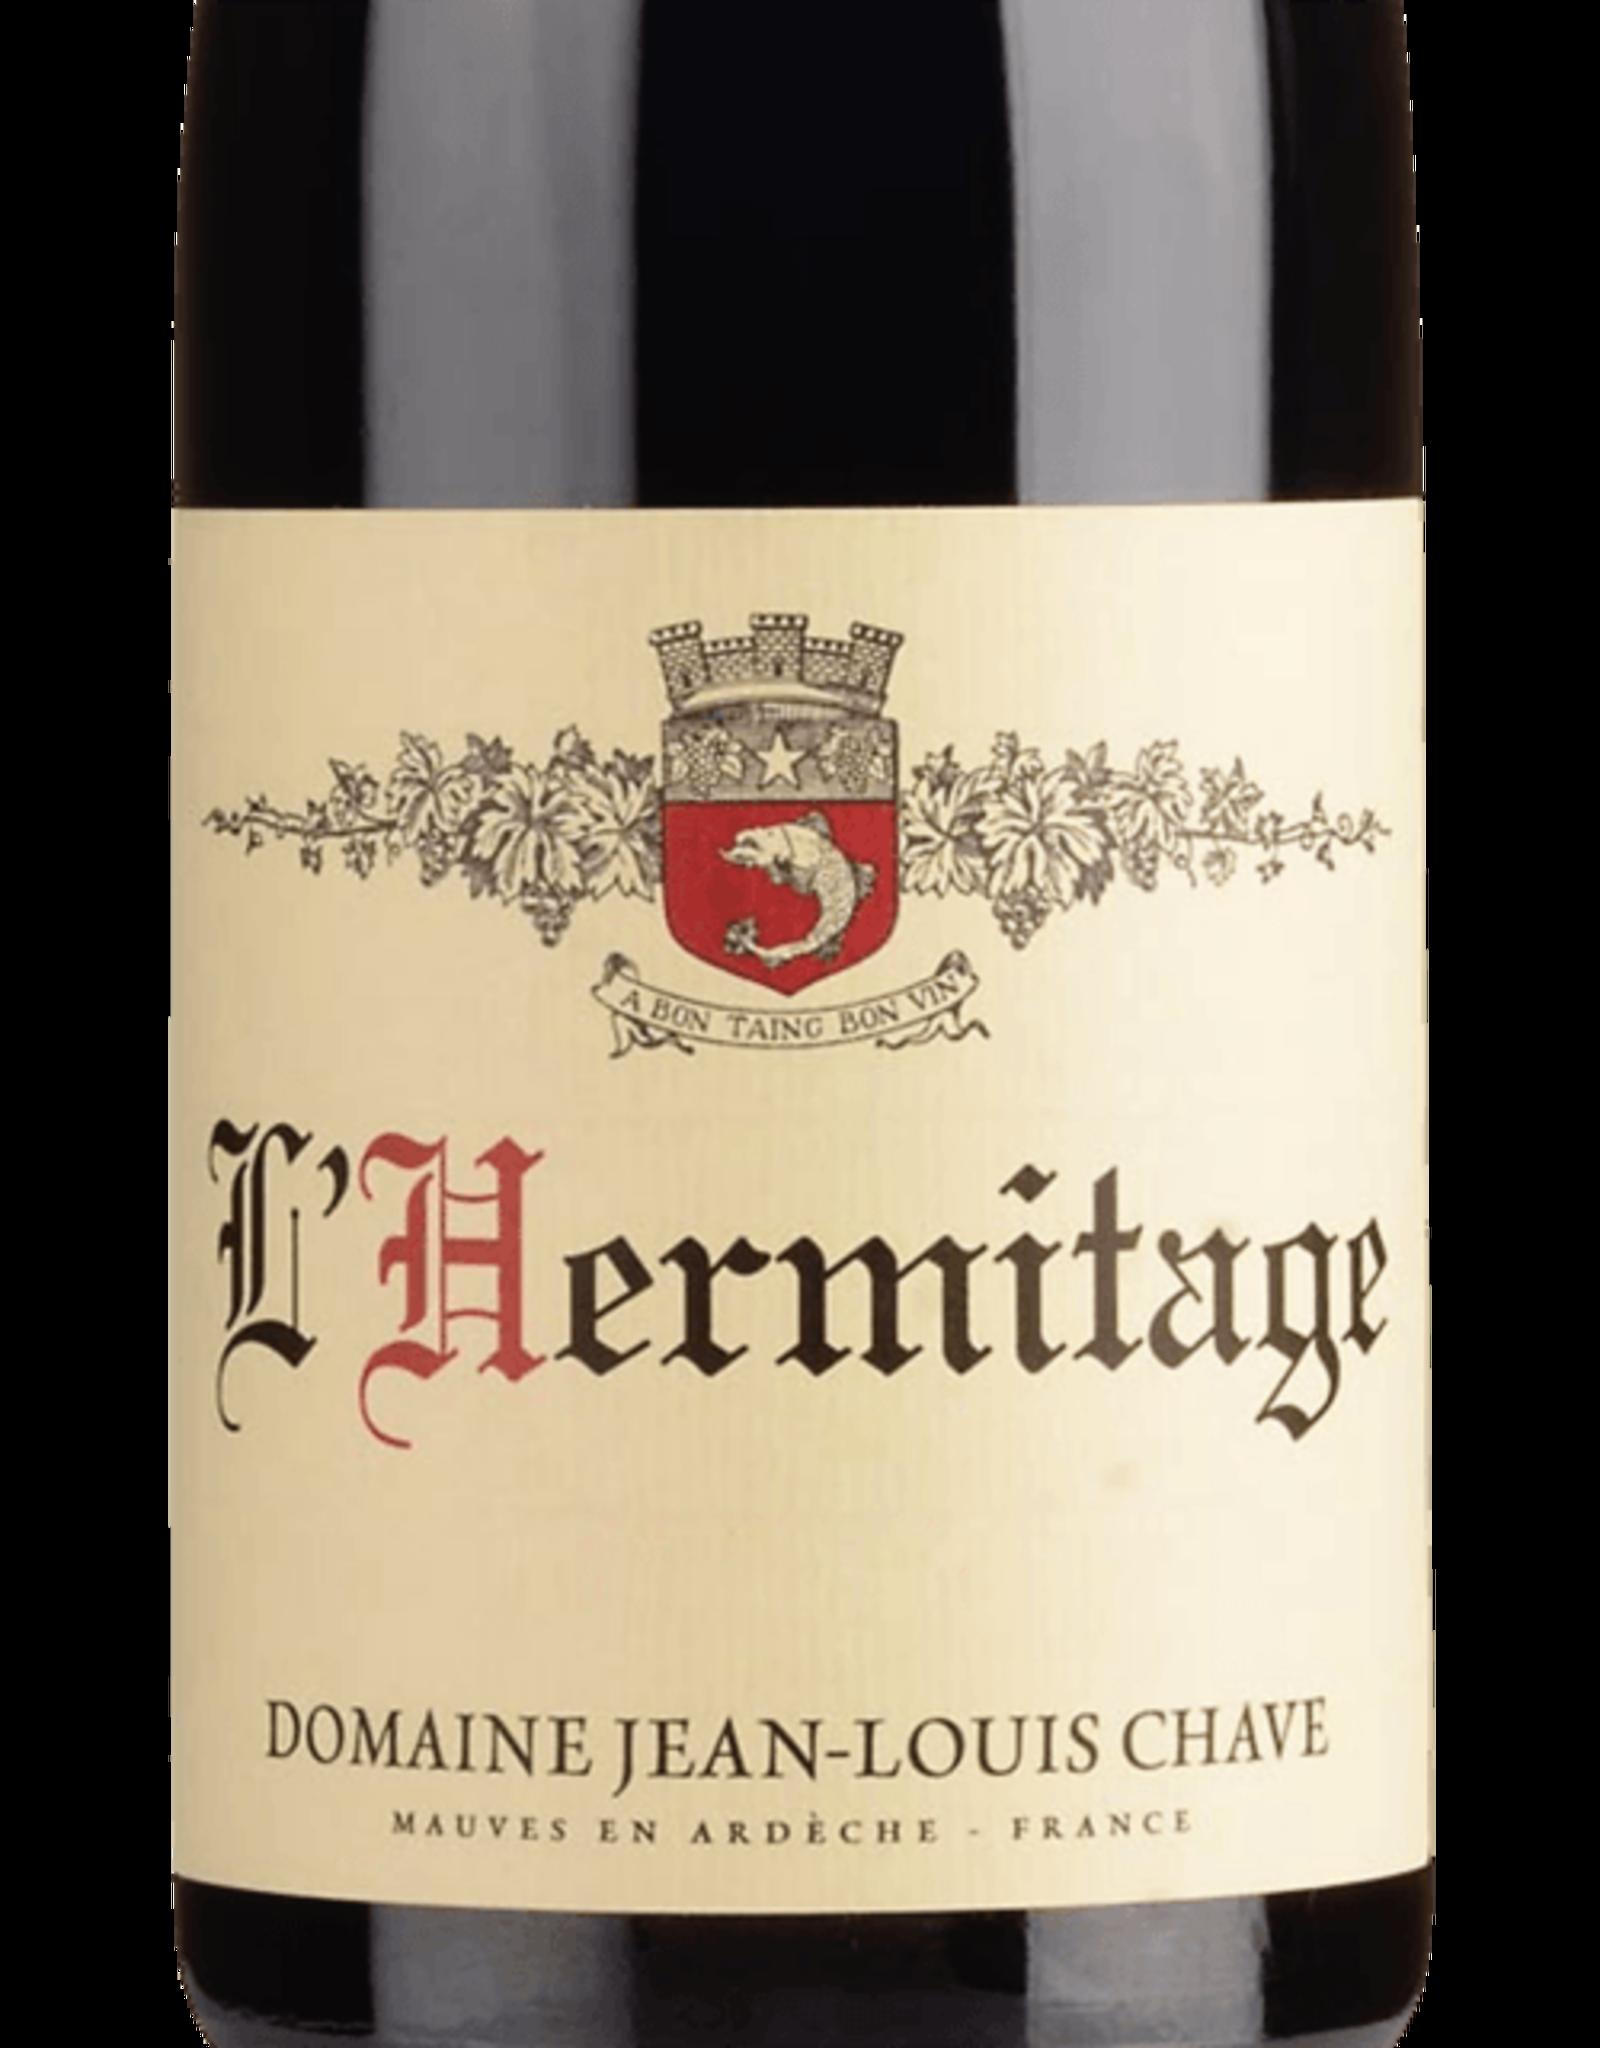 Domaine Jean-Louis Chave L'Hermitage 2013 Magnum